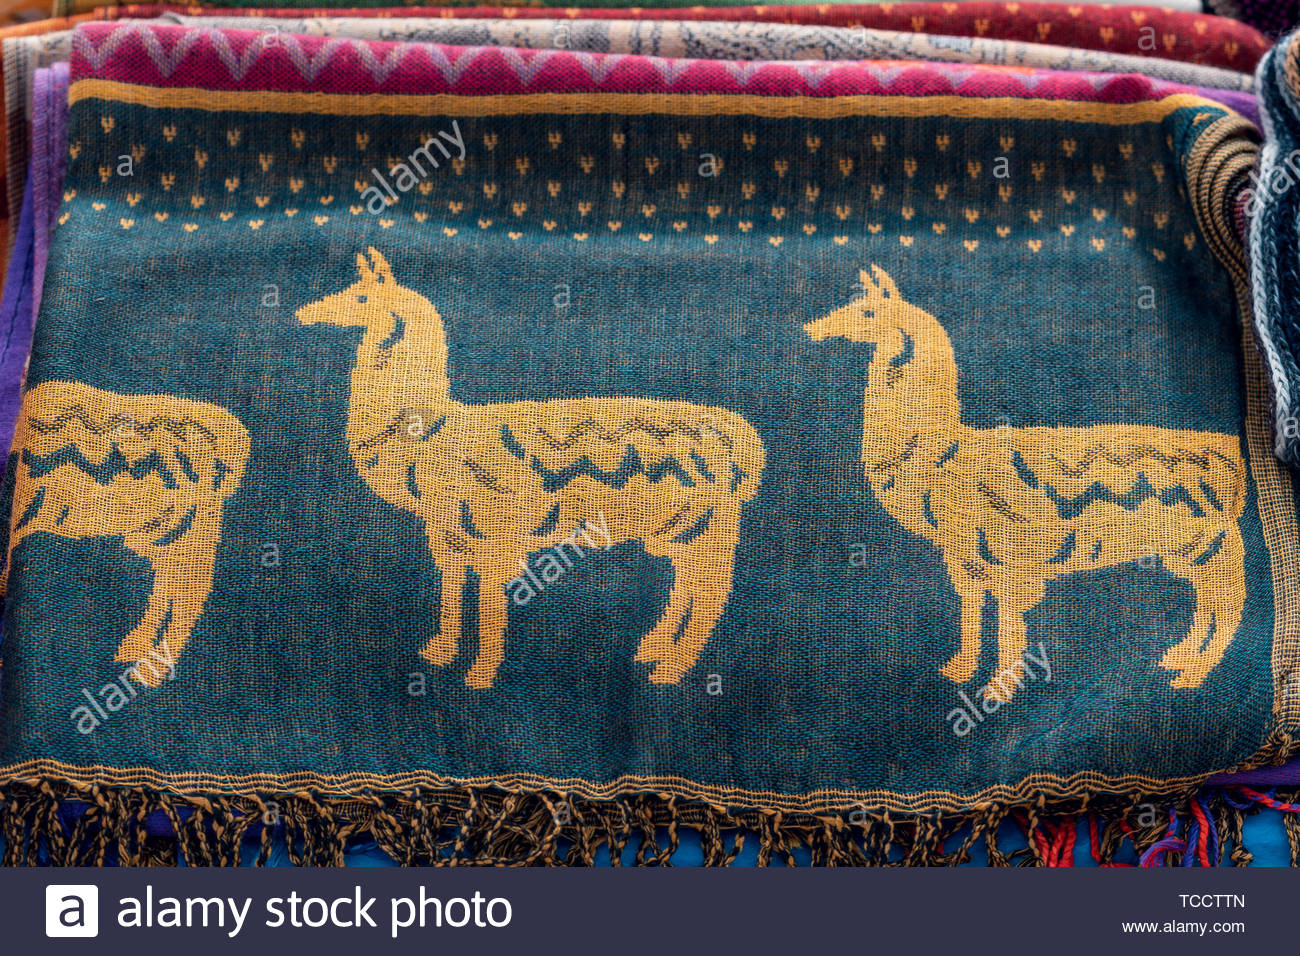 Fabrics and crafts Cajamarca Peru - Stock Image